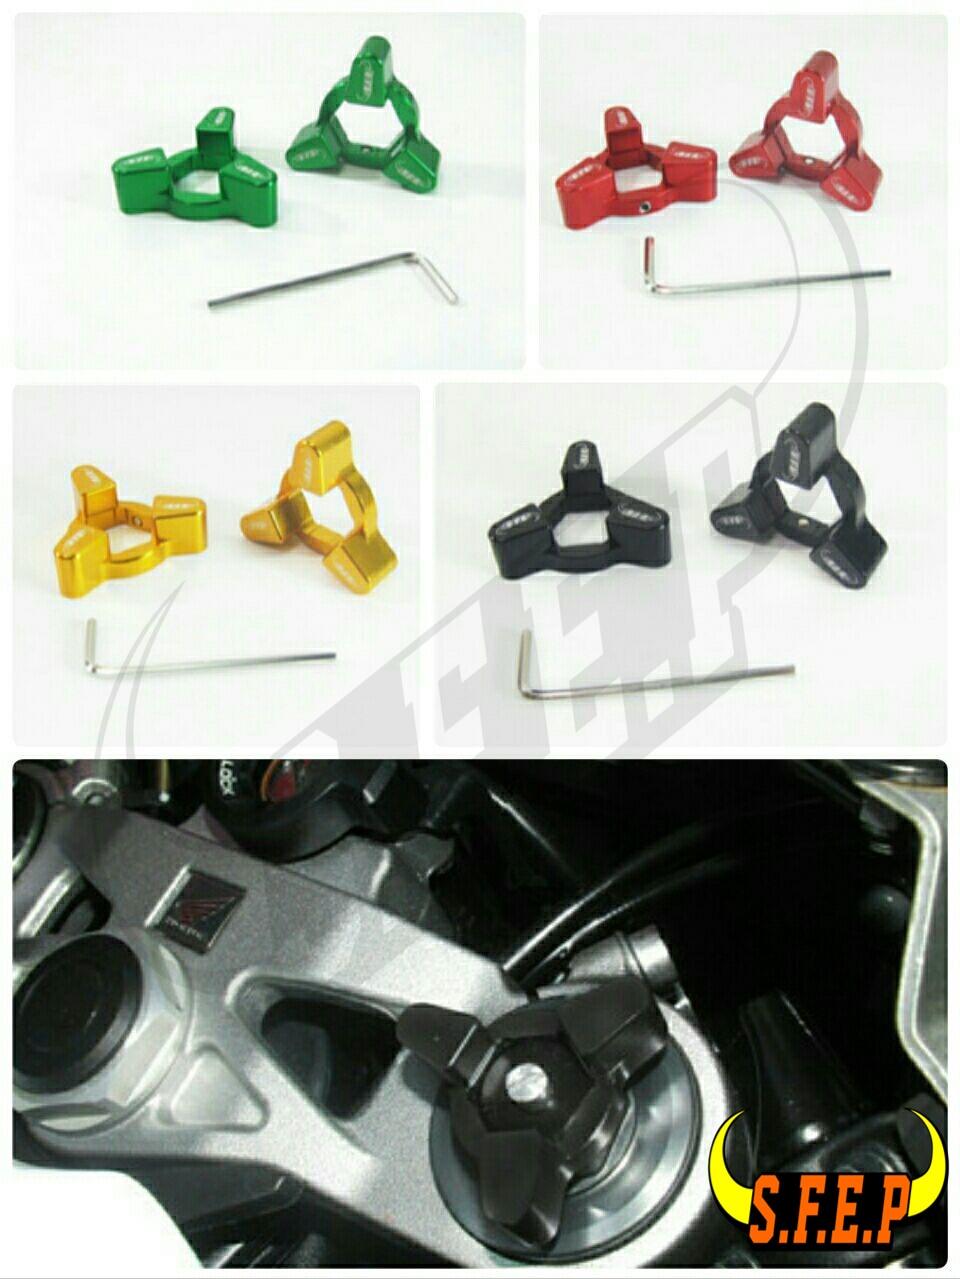 Motorcycle CNC Fork Preload Adjusters For Ducati 999 + 749 03-06/ Hypermotard 1100/S/EVO 07-08 +10